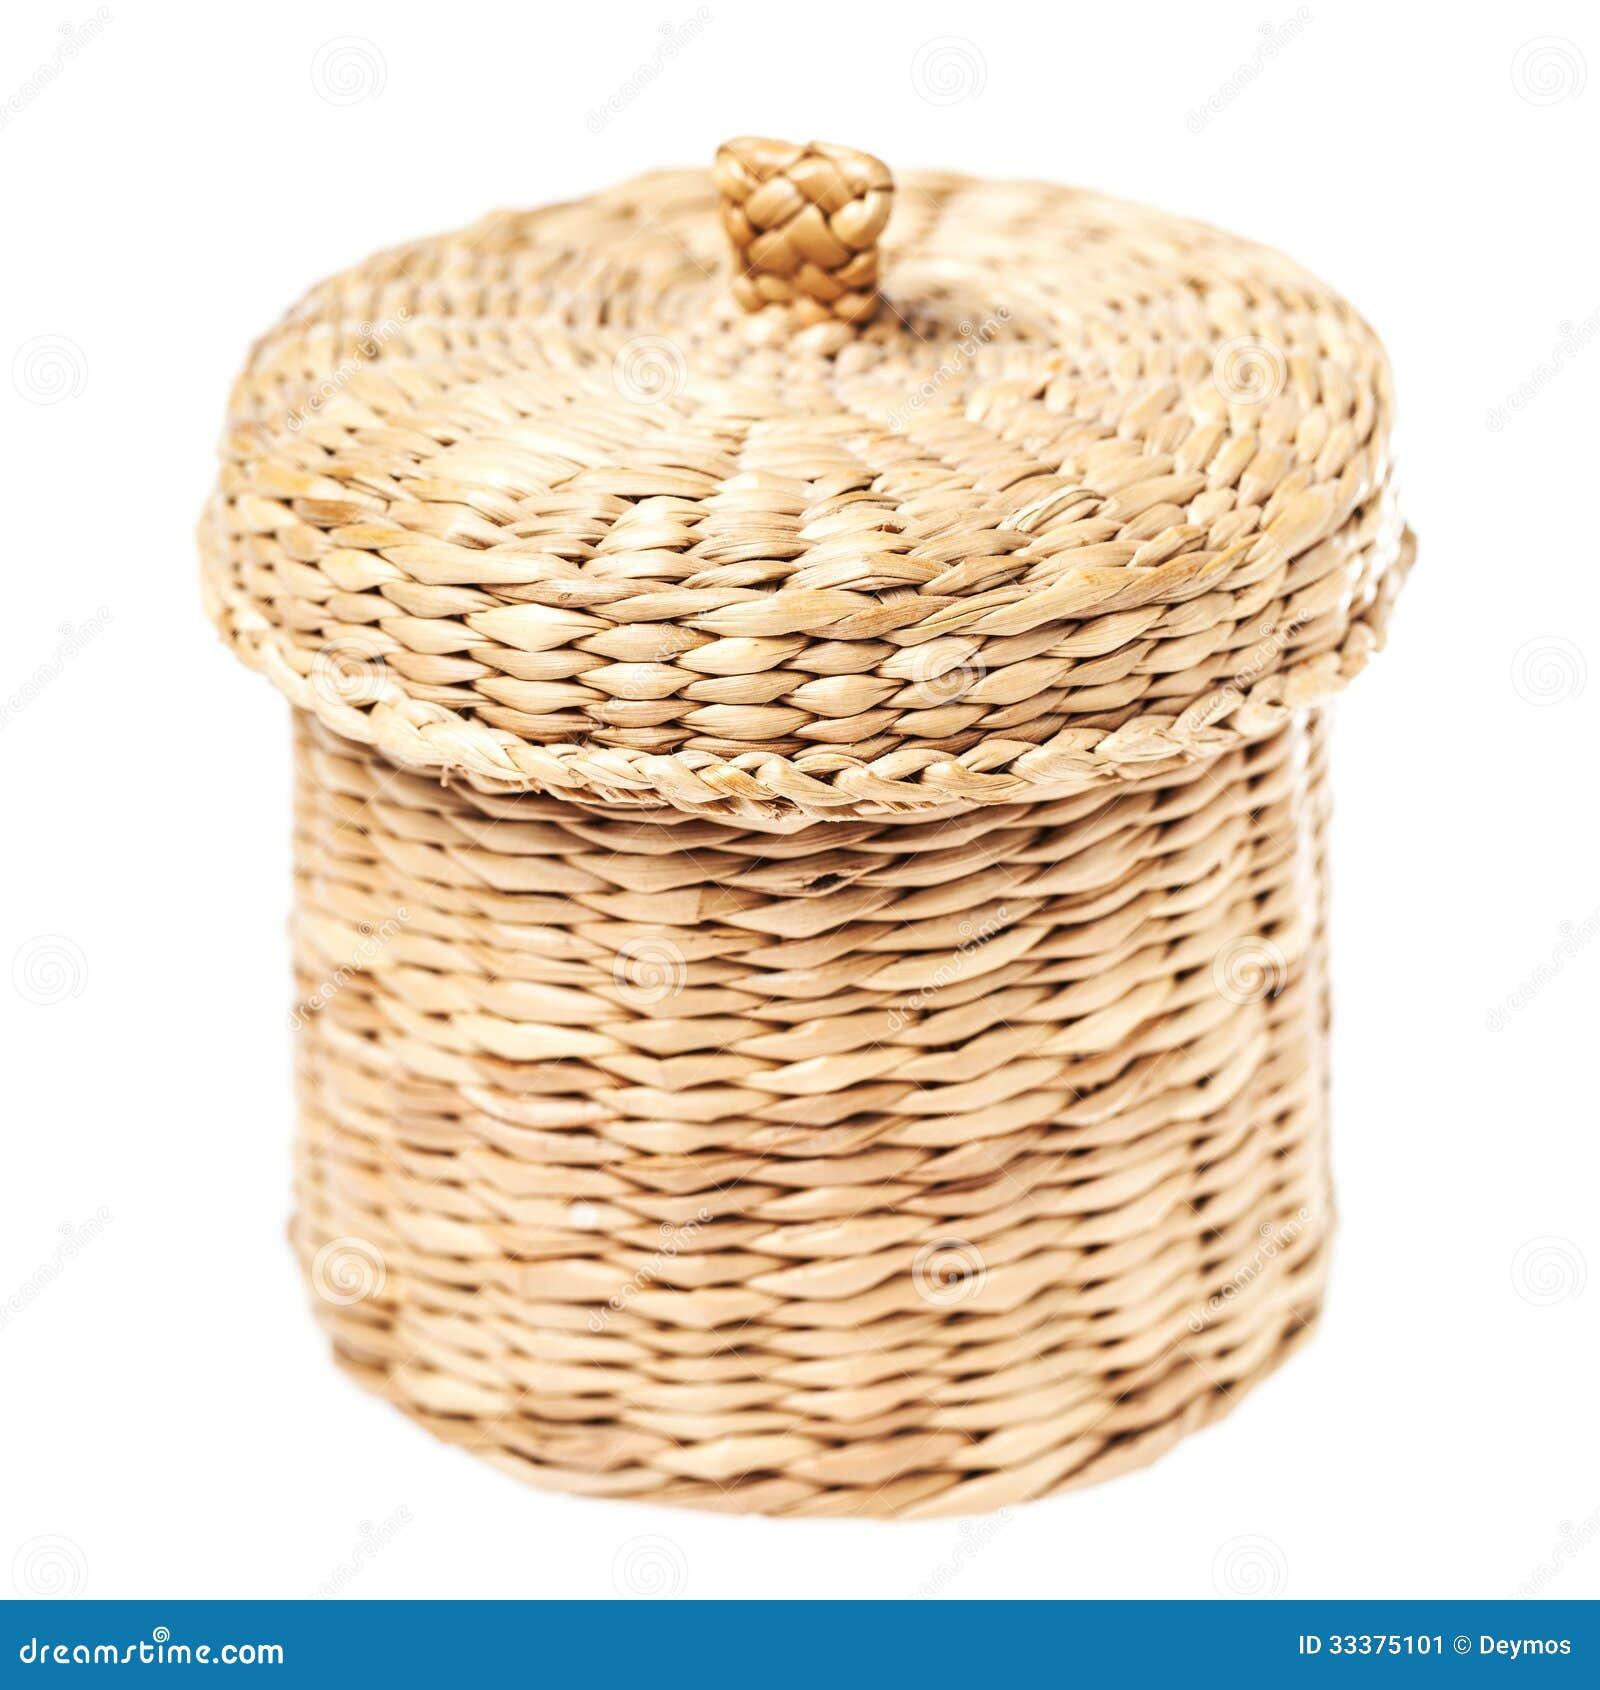 light brown wicker basket with closed lid stock image image 33375101. Black Bedroom Furniture Sets. Home Design Ideas